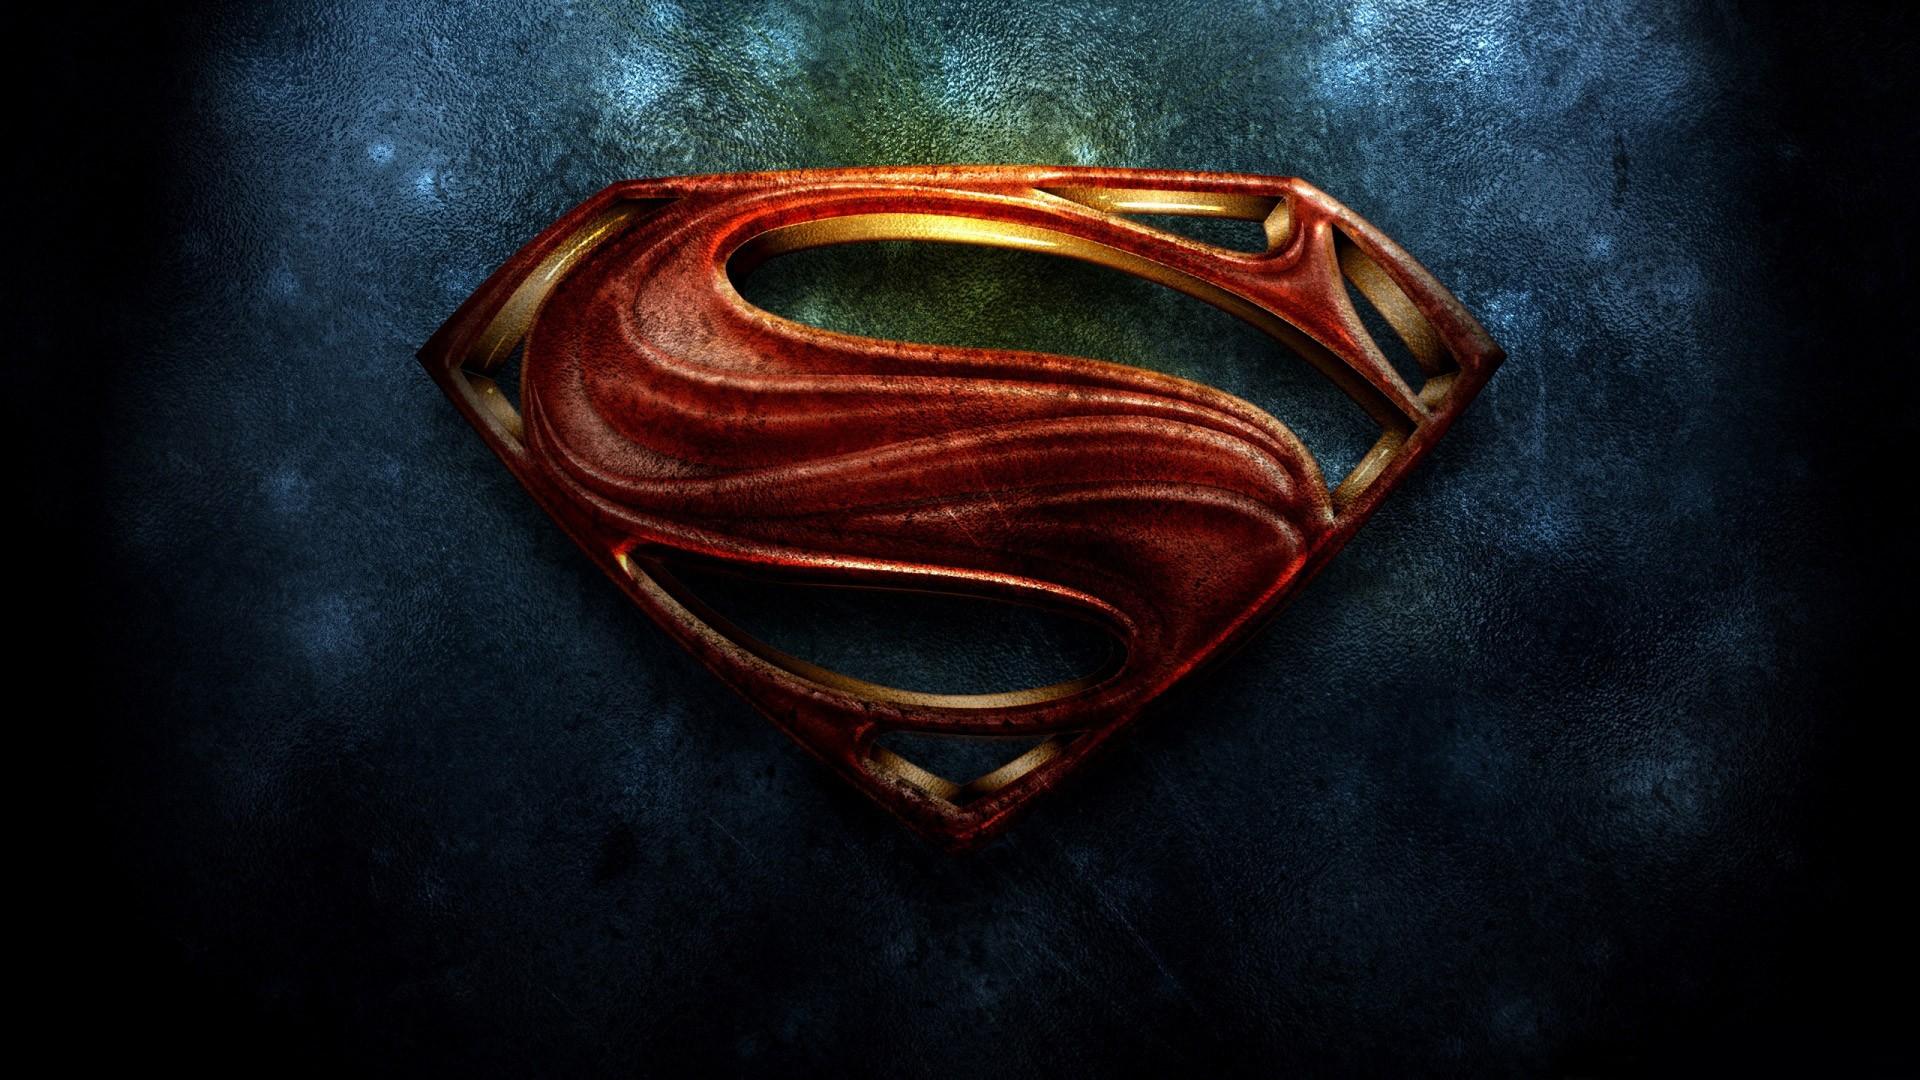 Superman Logo Hd Wallpaper Hd Wallpapers For Nokia E5 1920x1080 Wallpaper Teahub Io